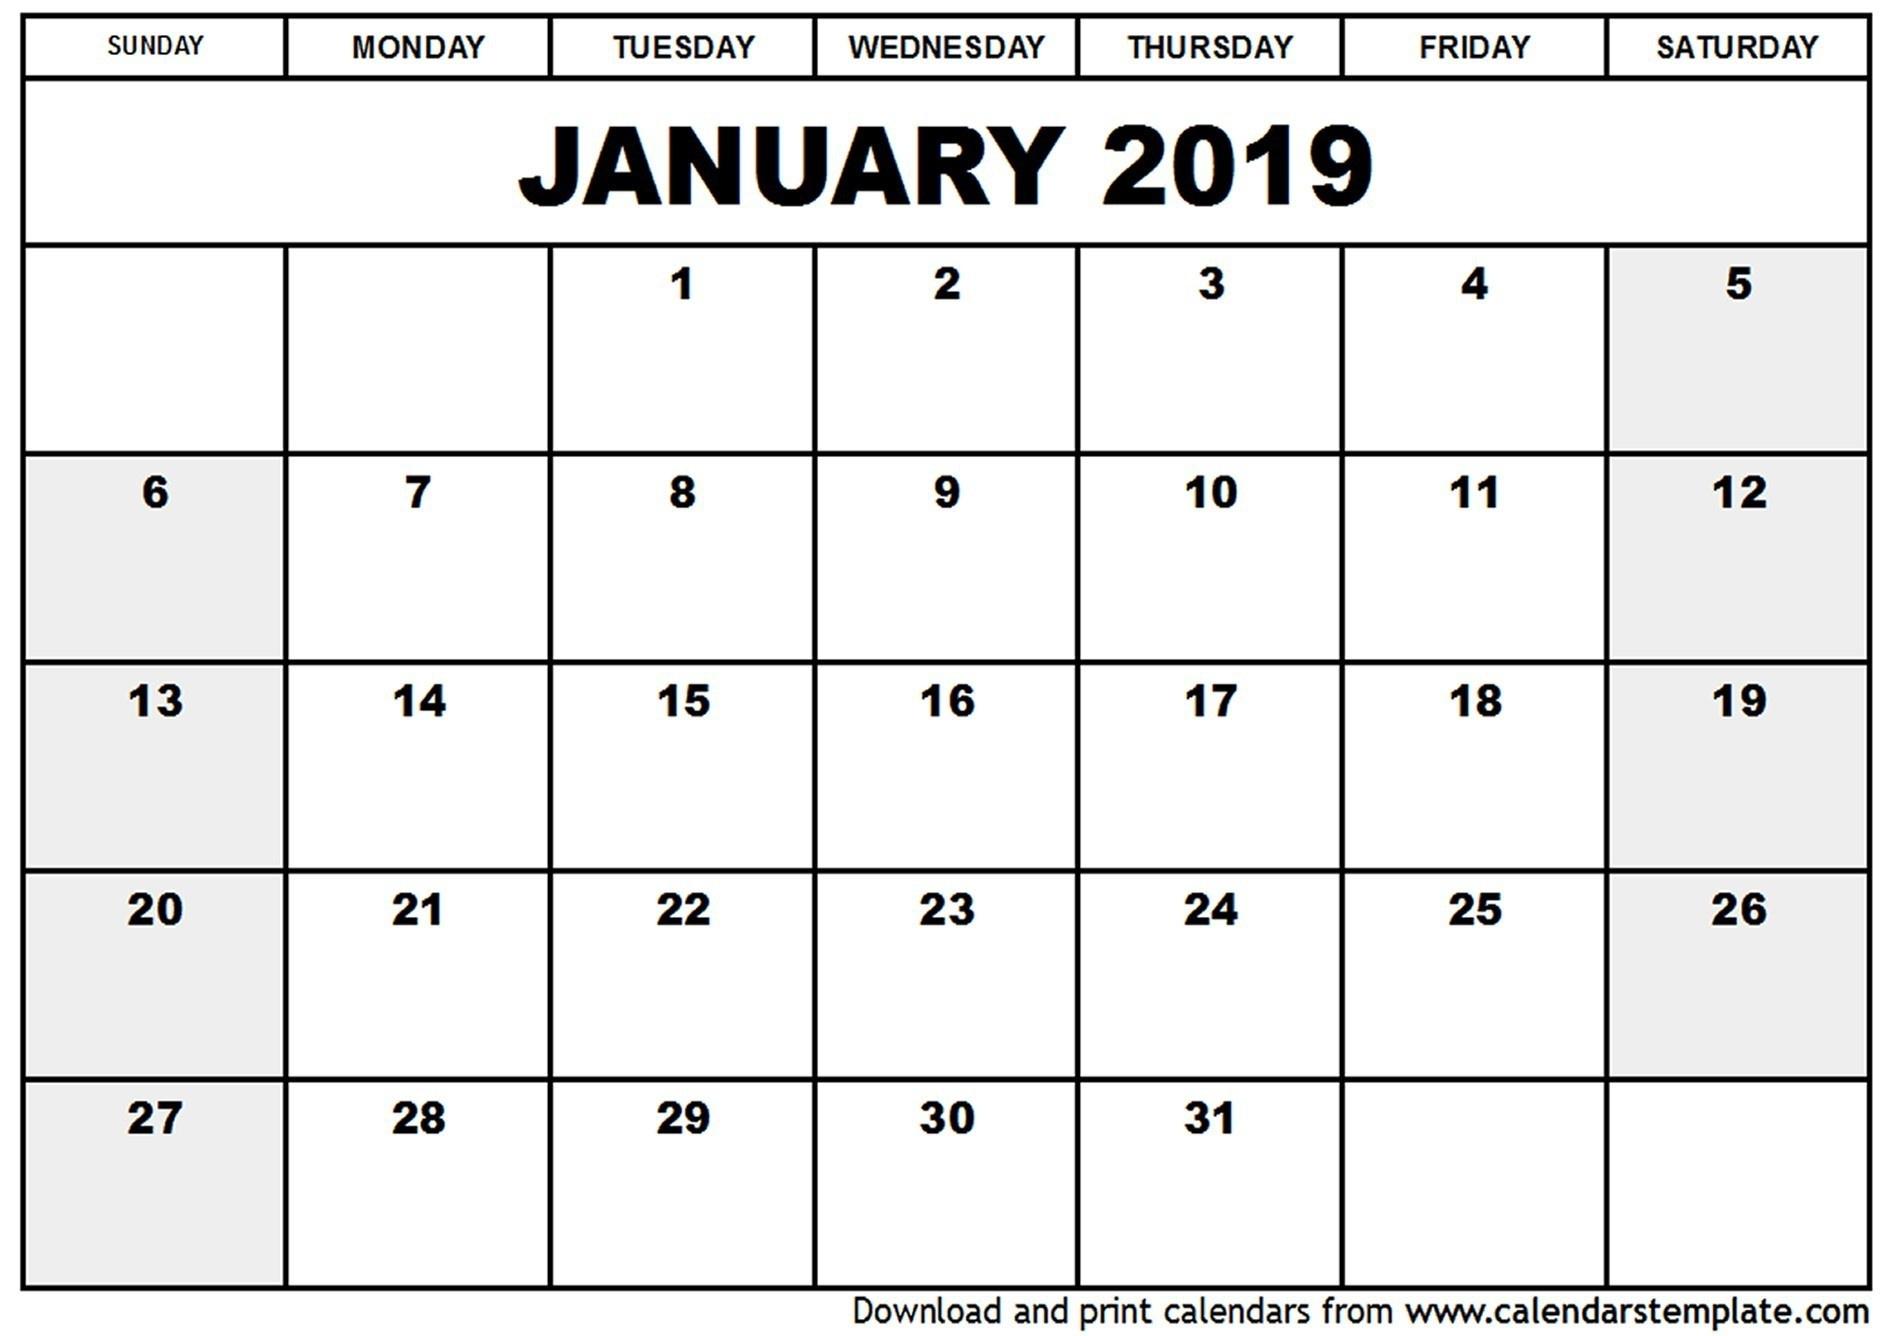 Blank Fillable Calendar 2019 – Template Calendar Design